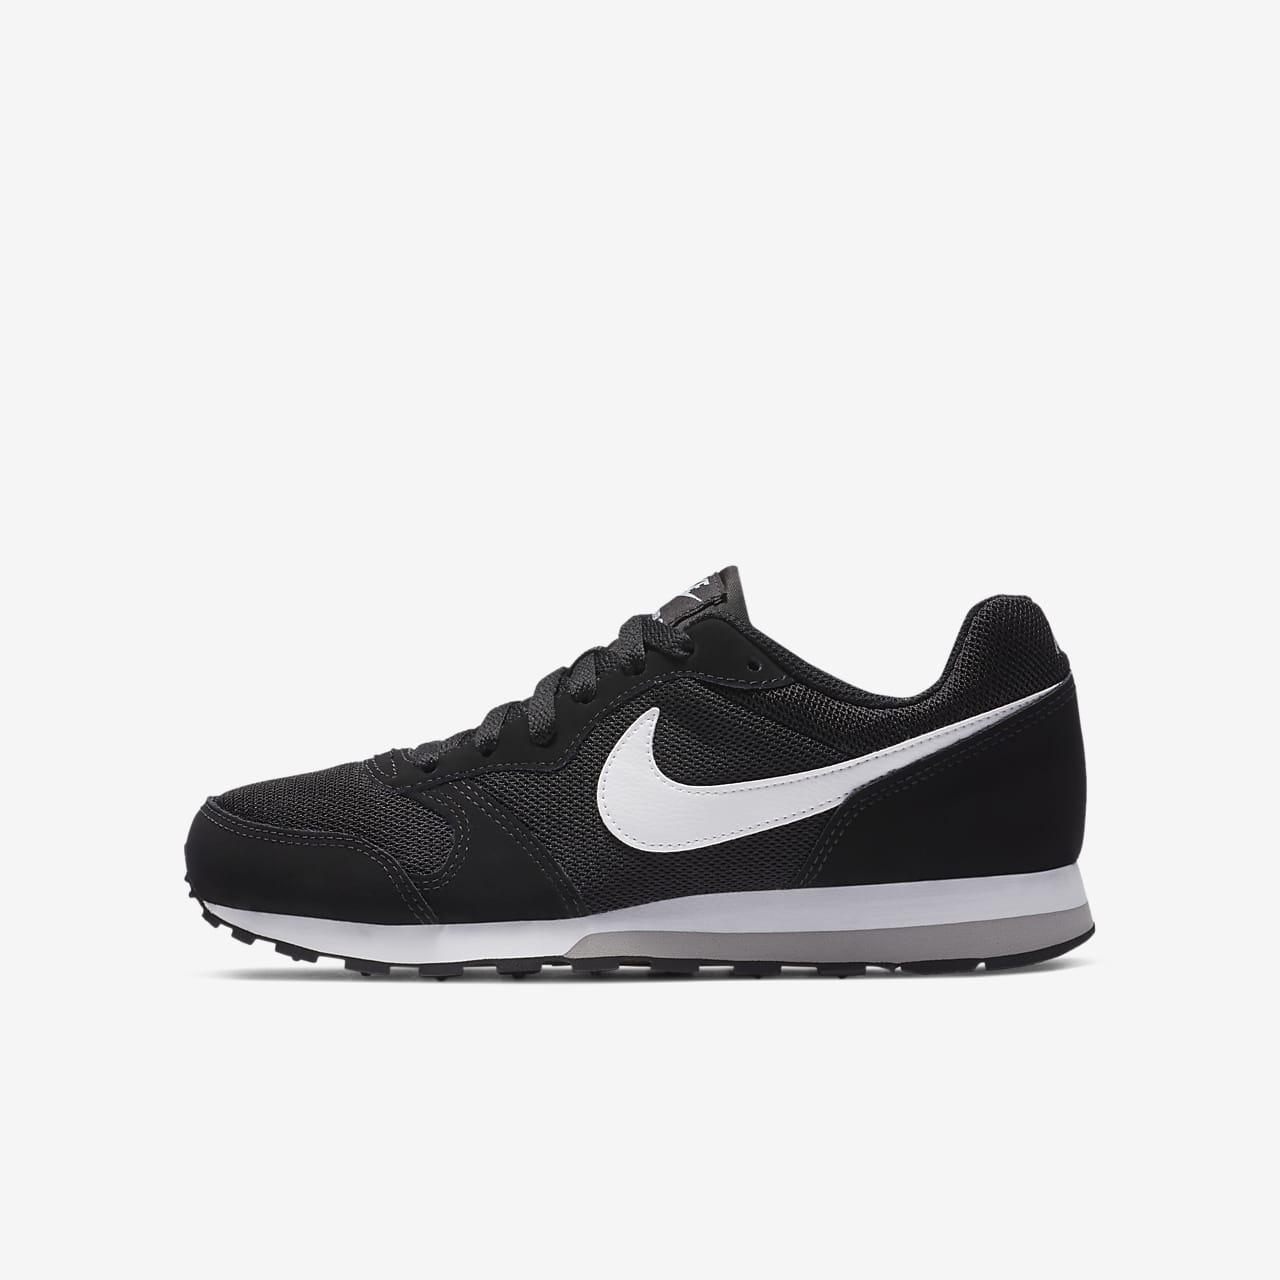 Nike GyerekeknekHu Md Nagyobb Cipő 2 Runner fyYbg76